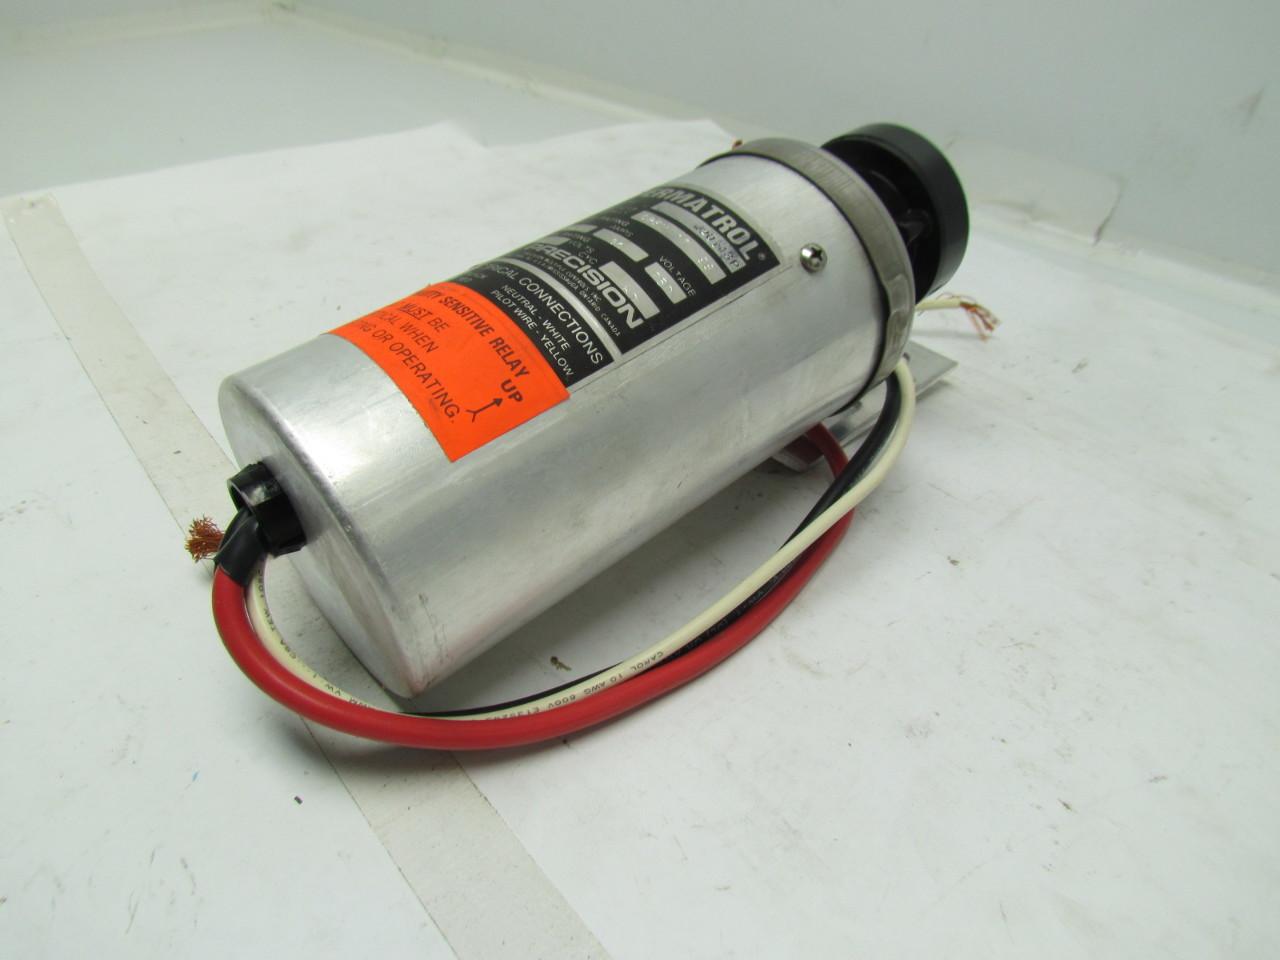 Precision j20113p n o permatrol mercury relay photo for Precision electric motor sales